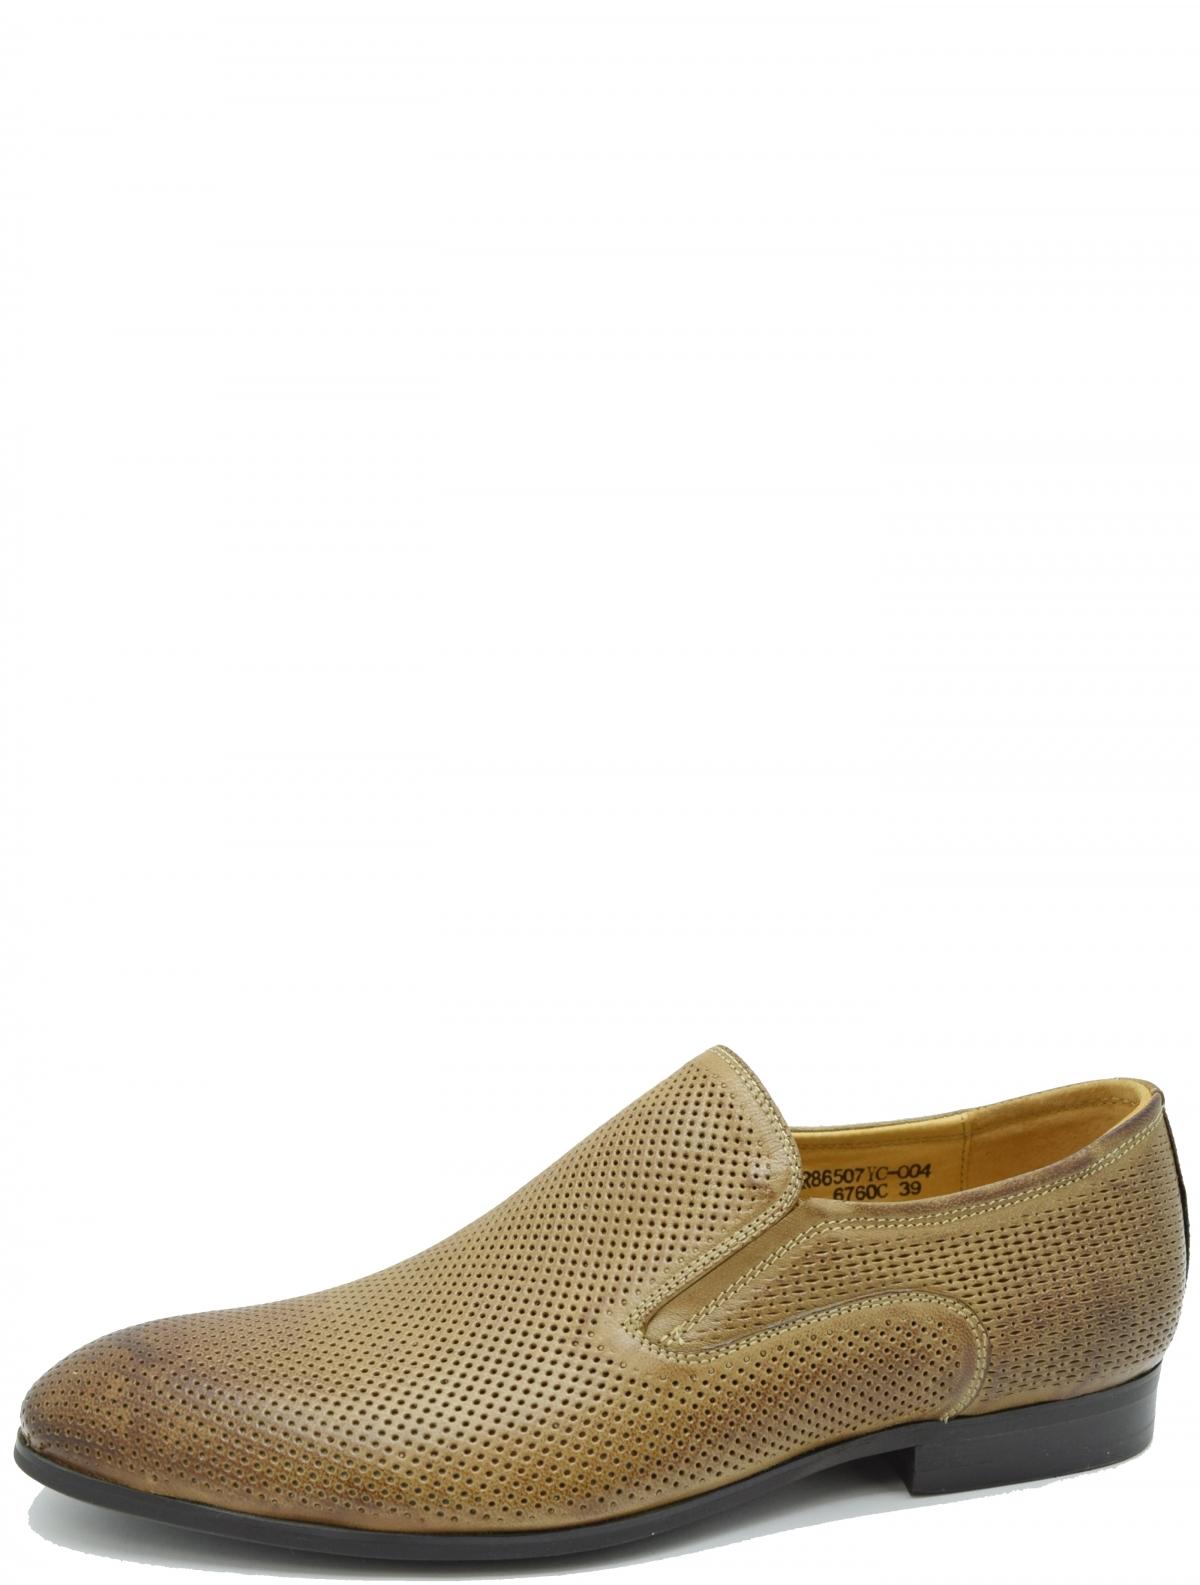 Rosconi R86507YC-004-6760C мужские туфли